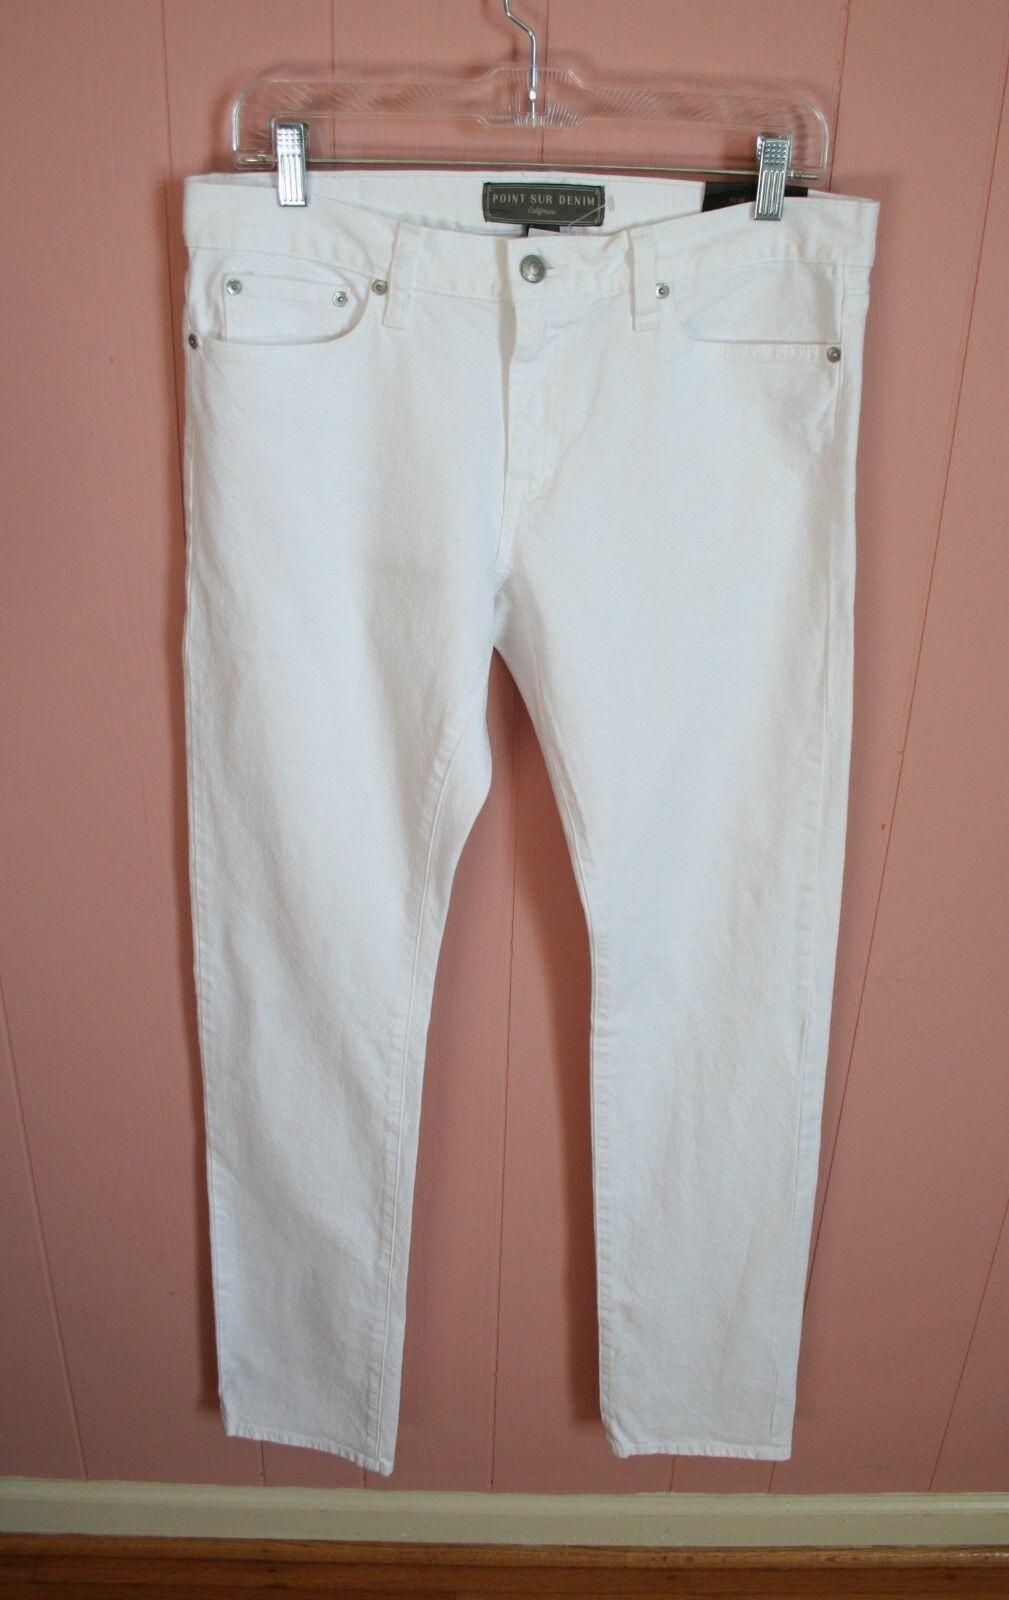 Point sur Slim Stacker Japanese selvedge Jean 29 8 Blanc Denim Jeans JCrew